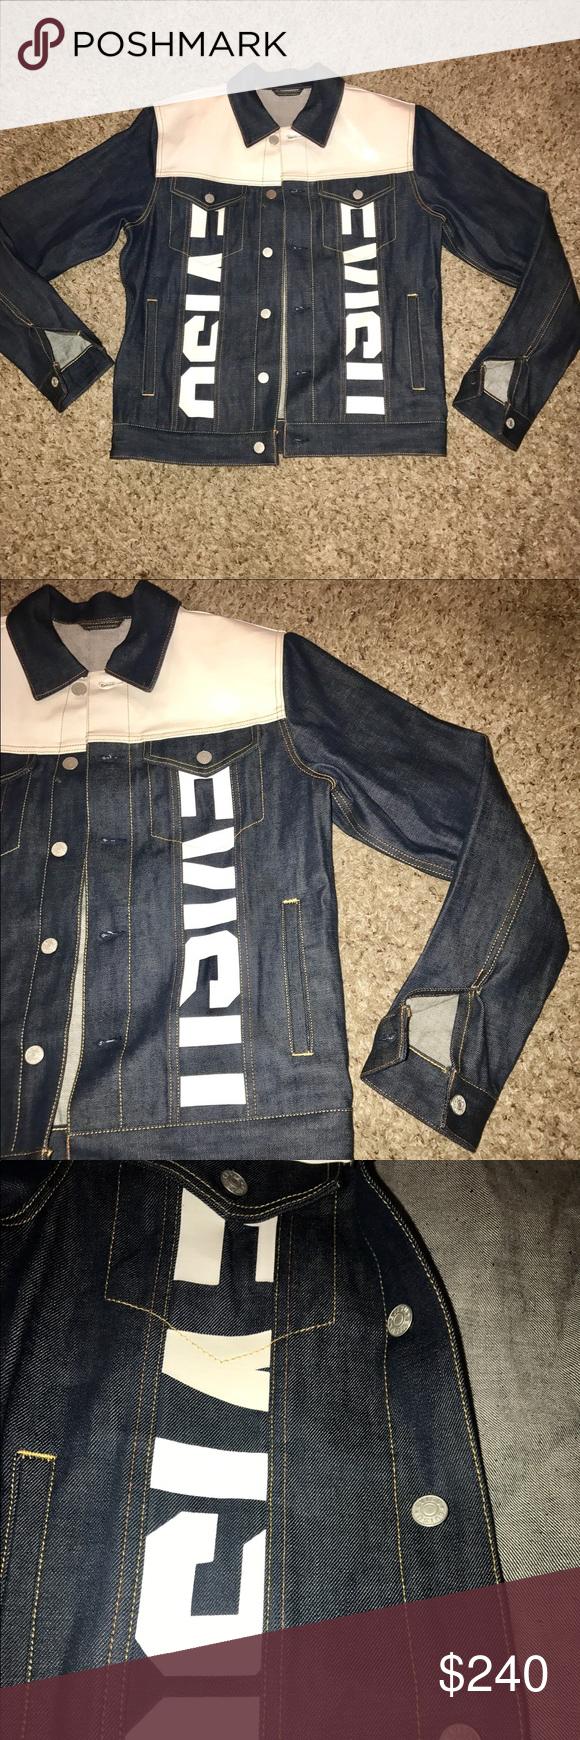 Nwot Custom Made Mens Evisu Jean Jacket Evisu Jeans Jackets Jean Jacket [ 1740 x 580 Pixel ]